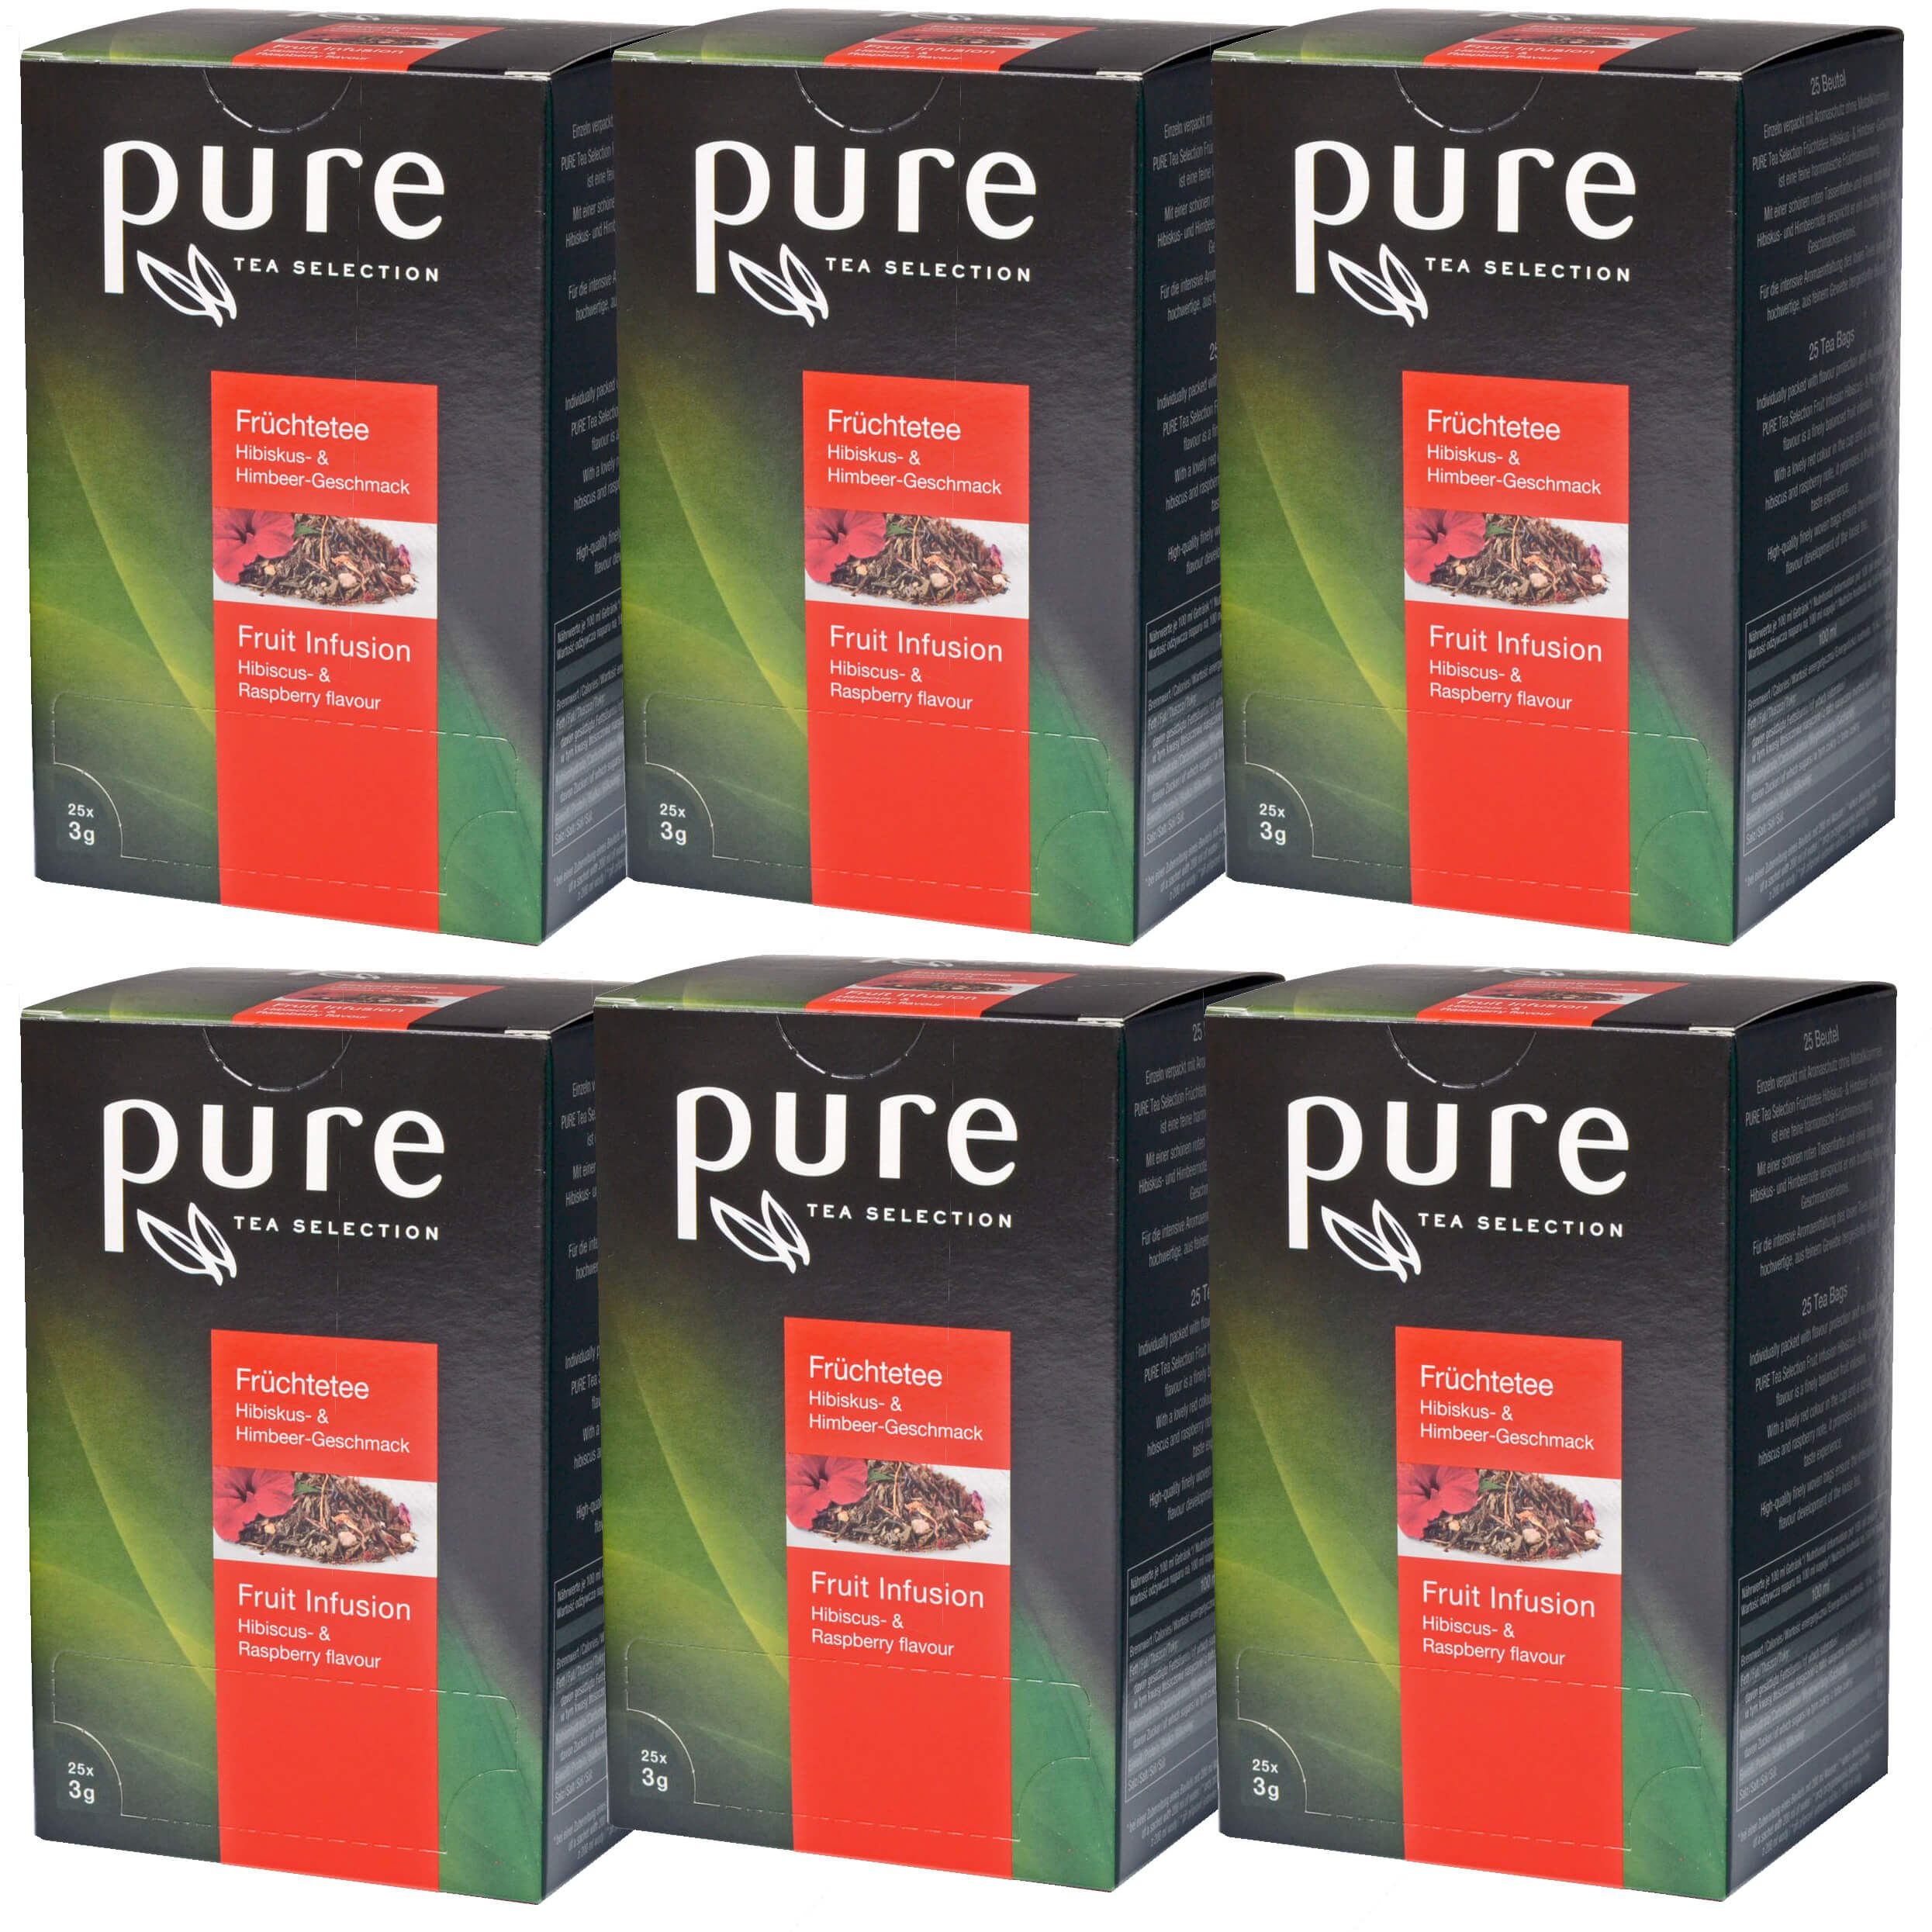 Tee-Hibiskus-Himbeere-aus-der-PURE-Tea-Selection-6-x-25-Sachets